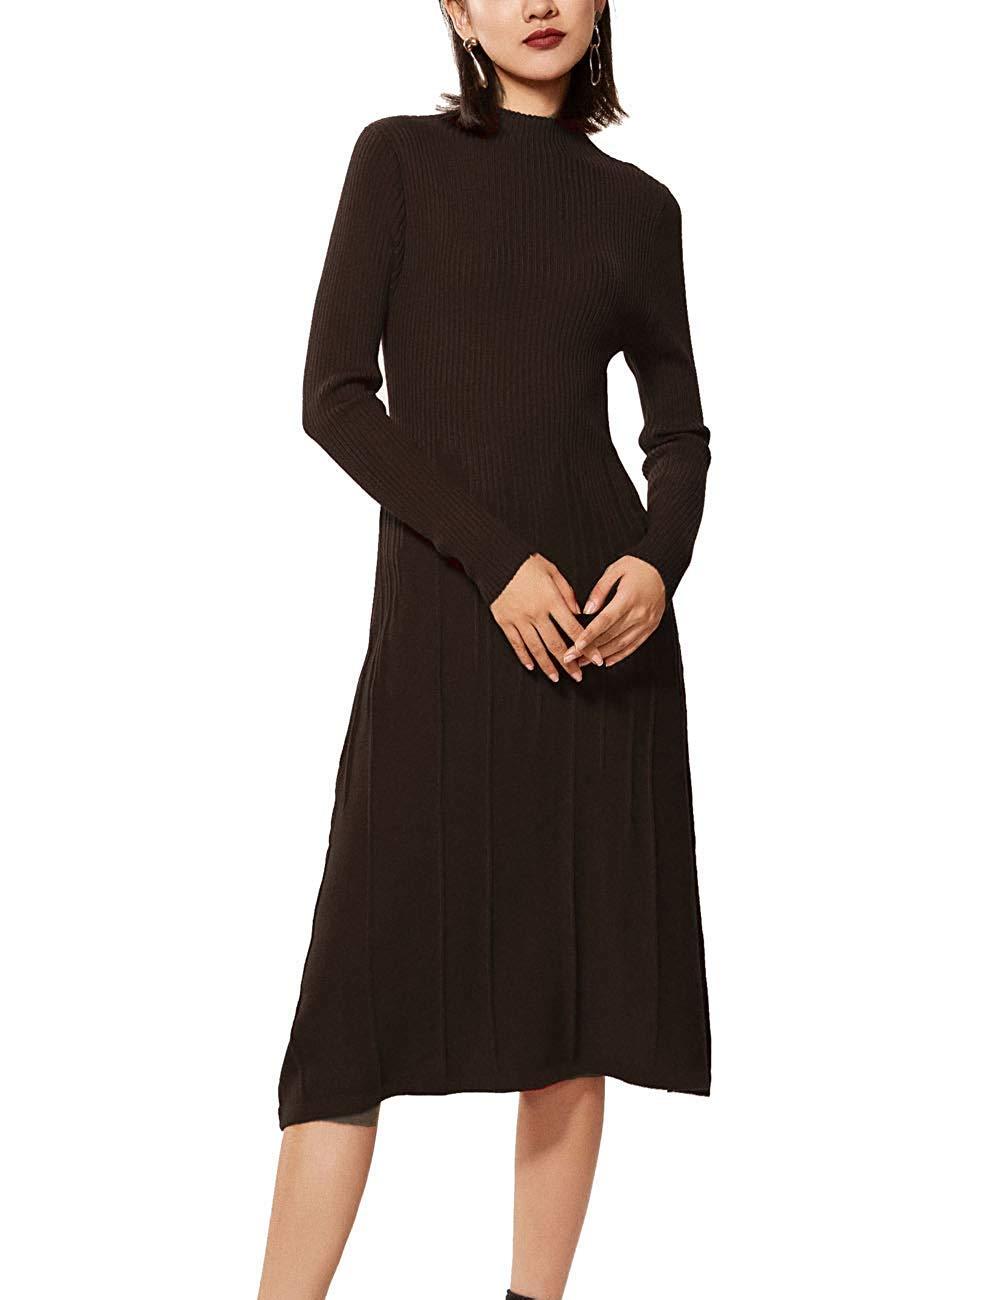 545008b60c7 RanRui Womens Winter Spring Dresses Sweater Dress Cashmere Long Sleeve  Elegant midi Dress (M